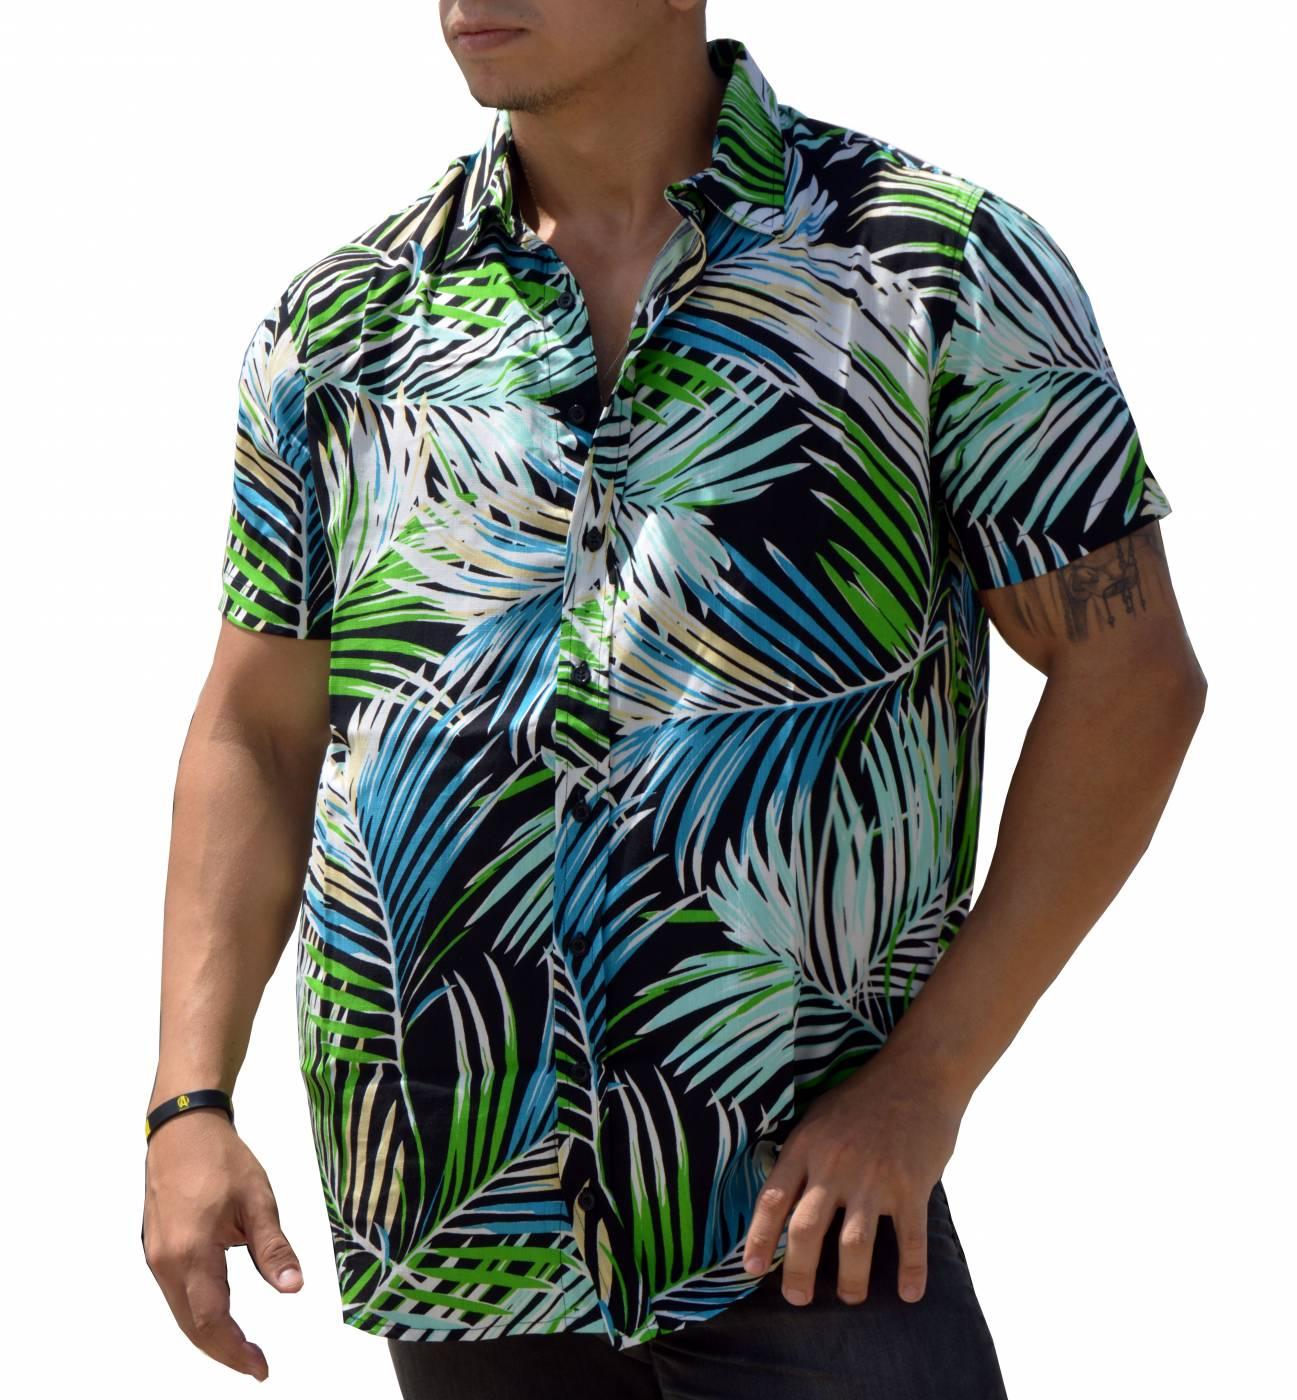 Camisa Masculina Viscose Estampa Folhagens